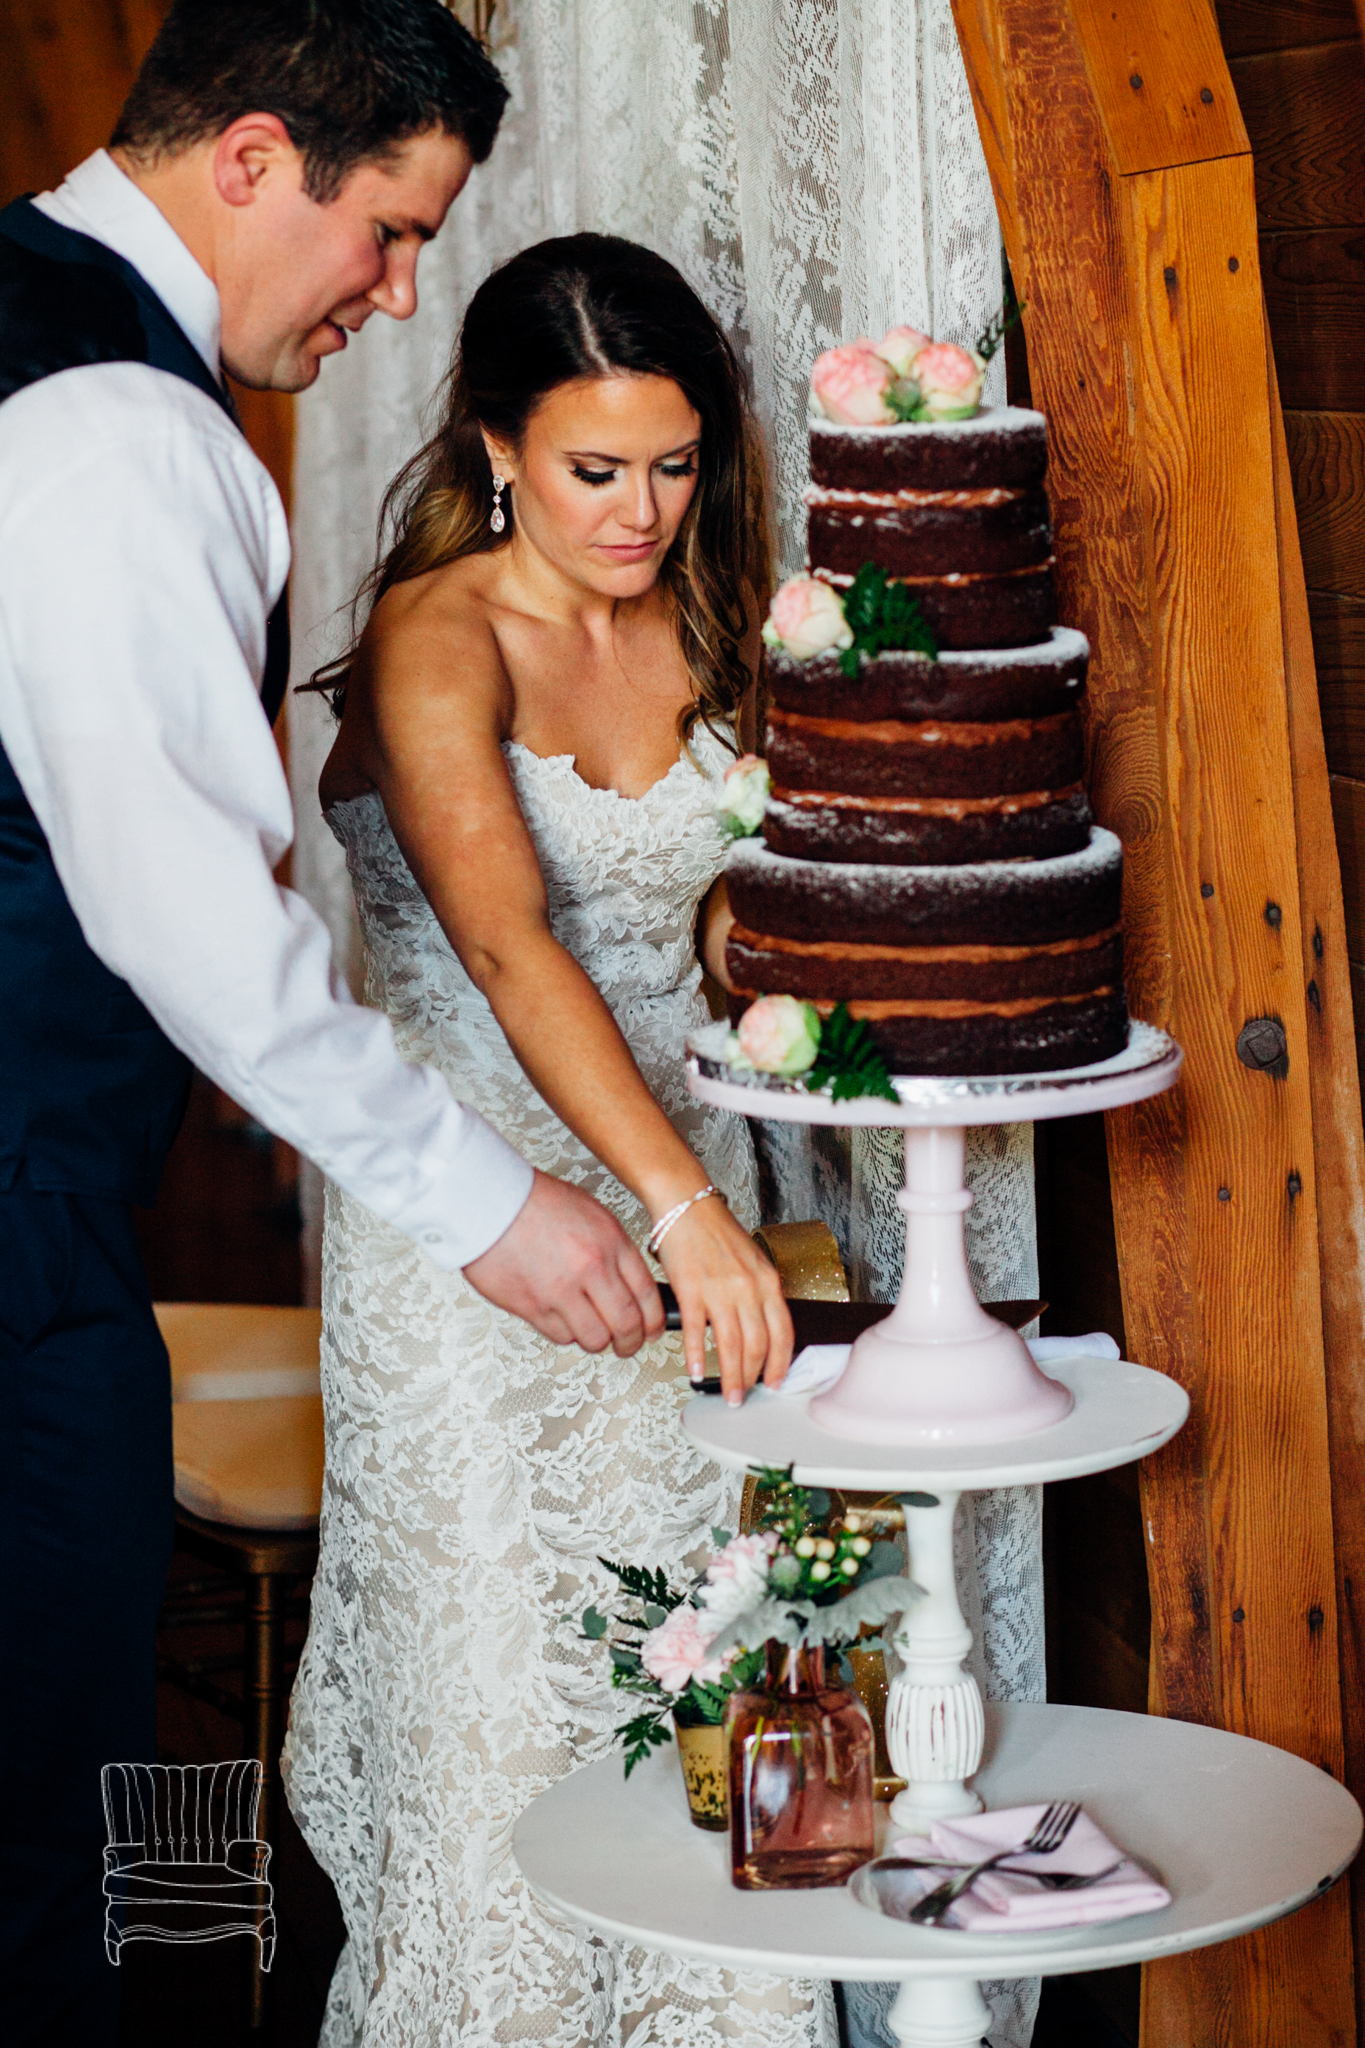 seattle-wedding-photographer-katheryn-moran-russells-bothell-wilkins-wedding-photo-61.jpg